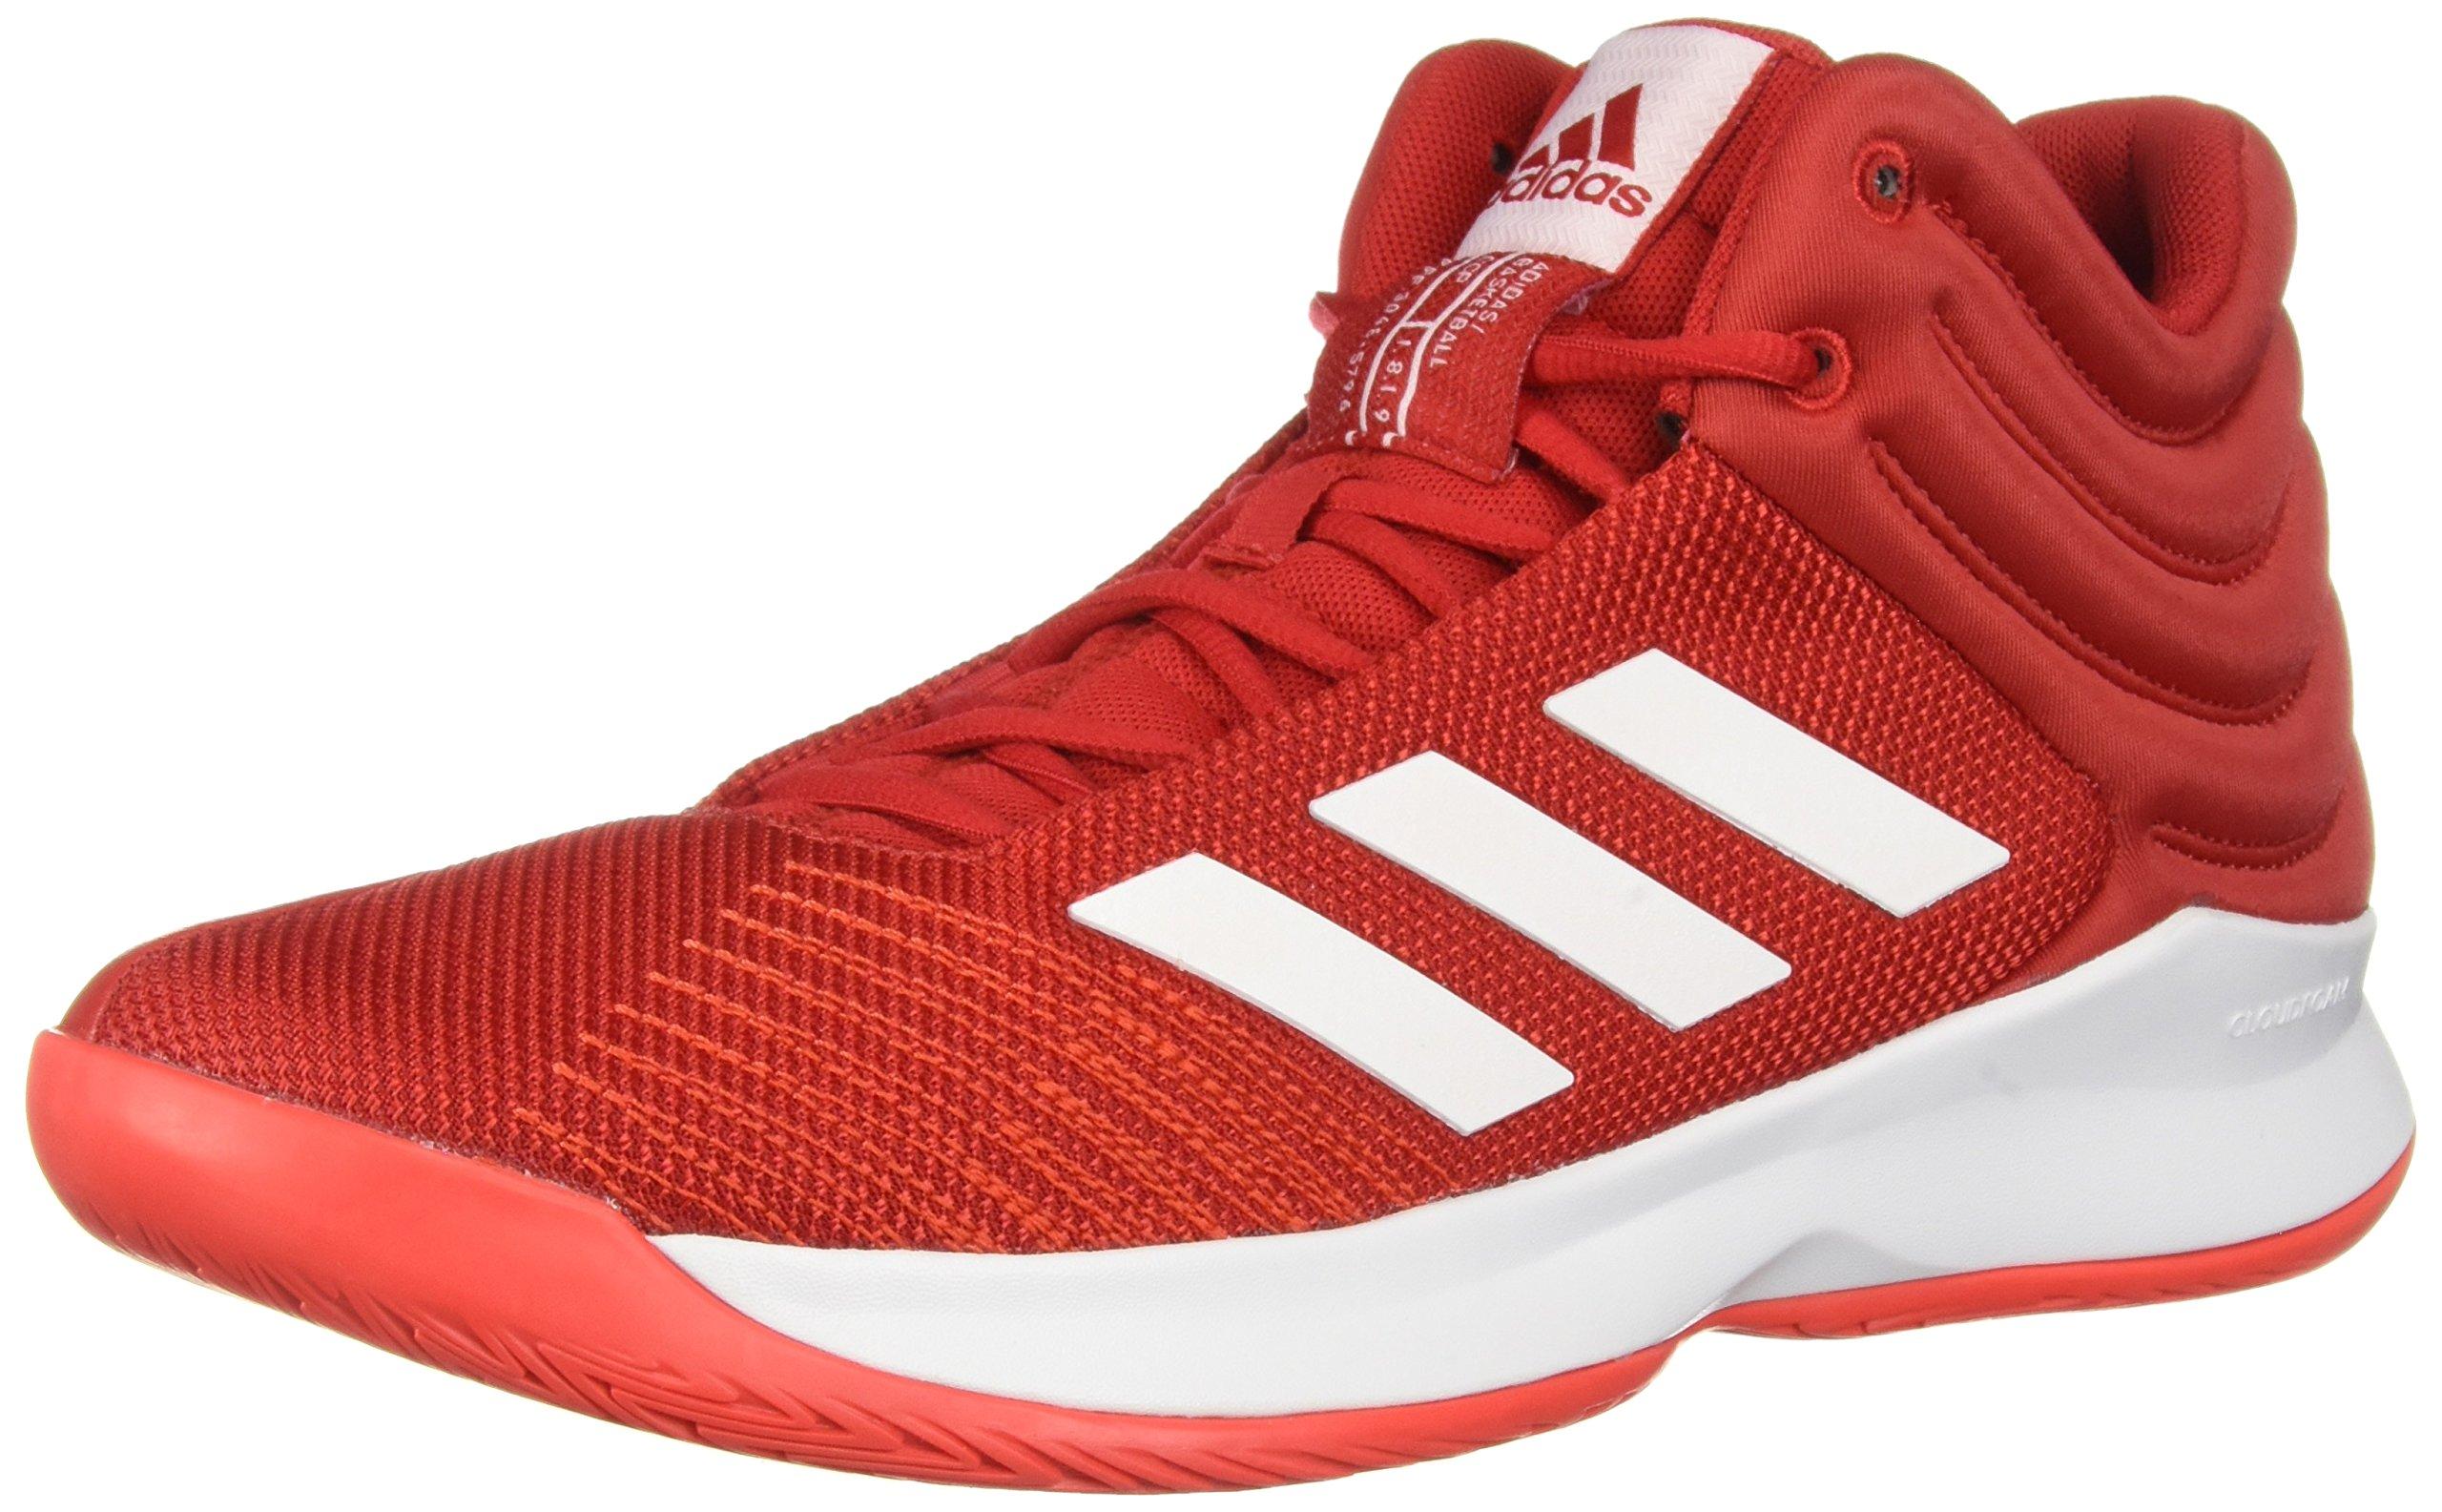 Galleon - Adidas Men s Pro Spark 2018 Basketball Shoe 1a4994aa806